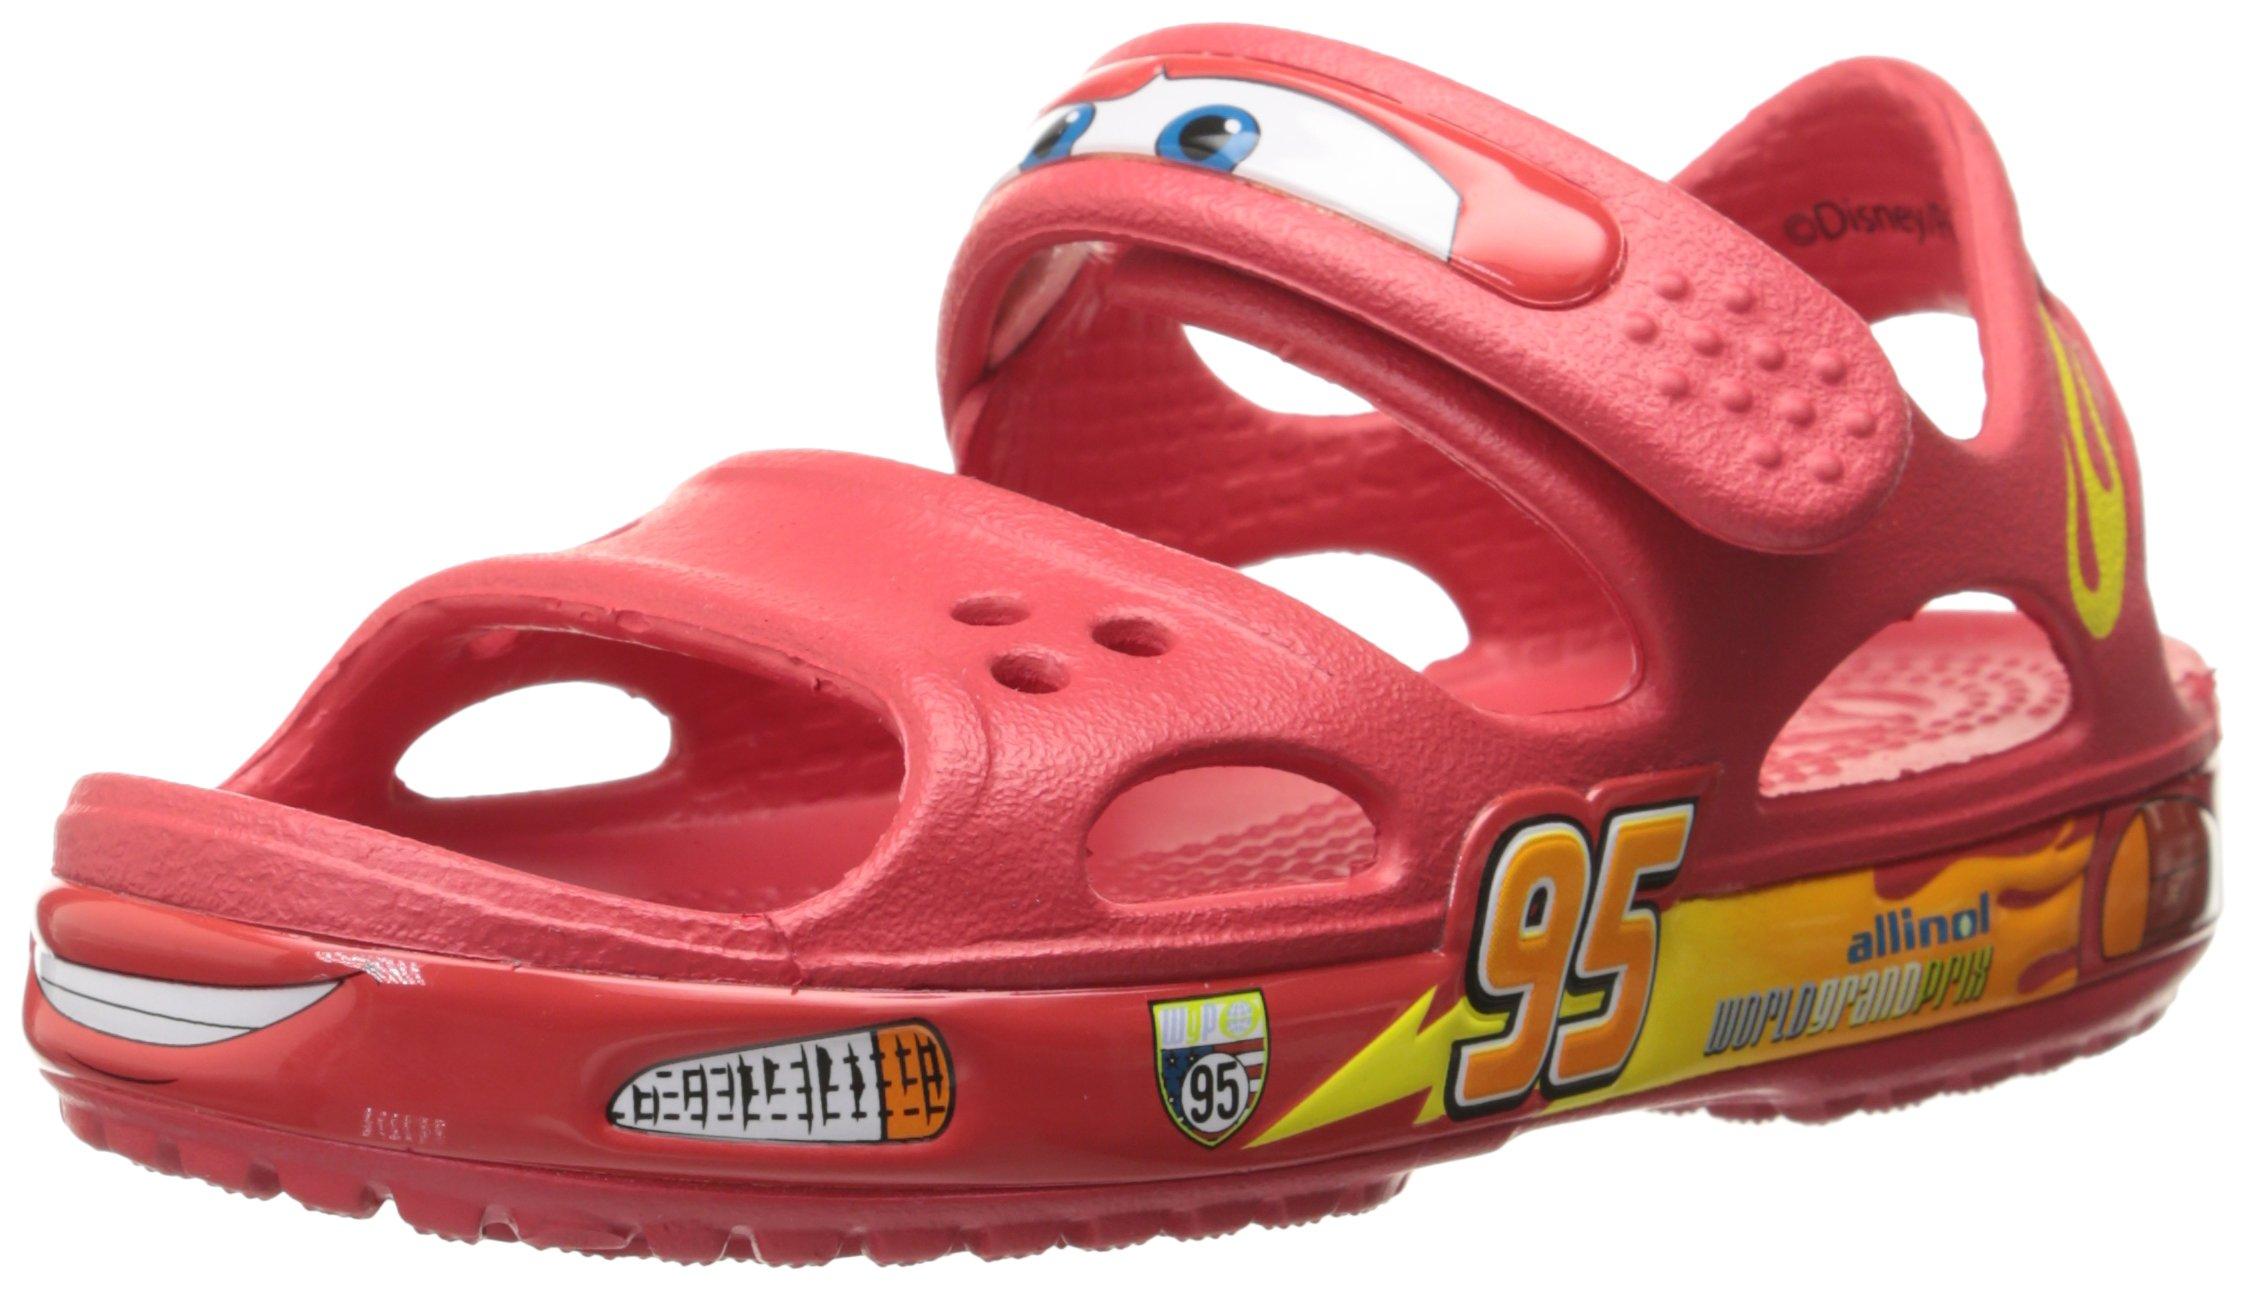 Crocs Crocband II Cars Sandal (Toddler/Little Kid), Red, 6 M US Toddler by Crocs (Image #1)